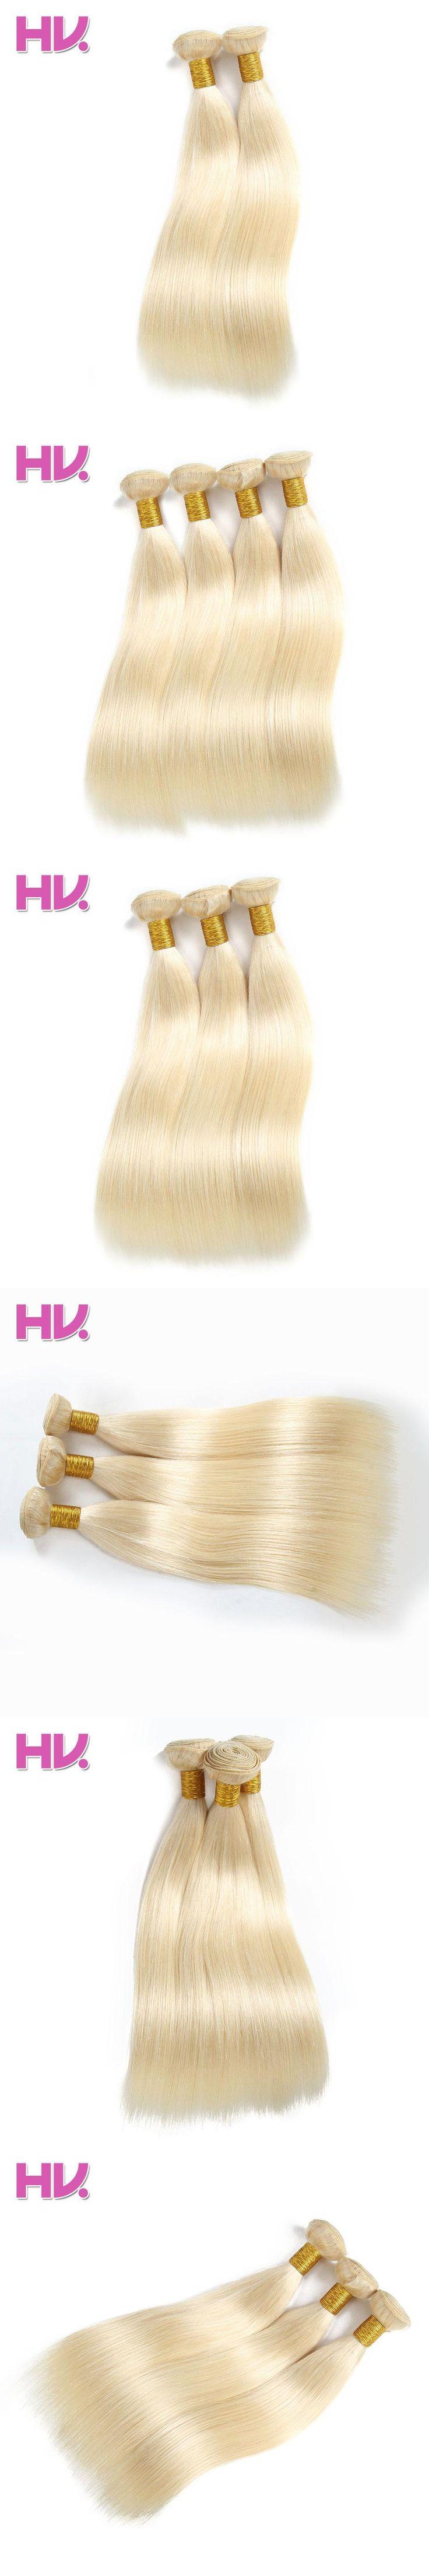 Hair Villa Pre-colored Non-Remy Hair Weft Human Hair Weave Brazilian Straight Hair Weave #613 10-24 inch